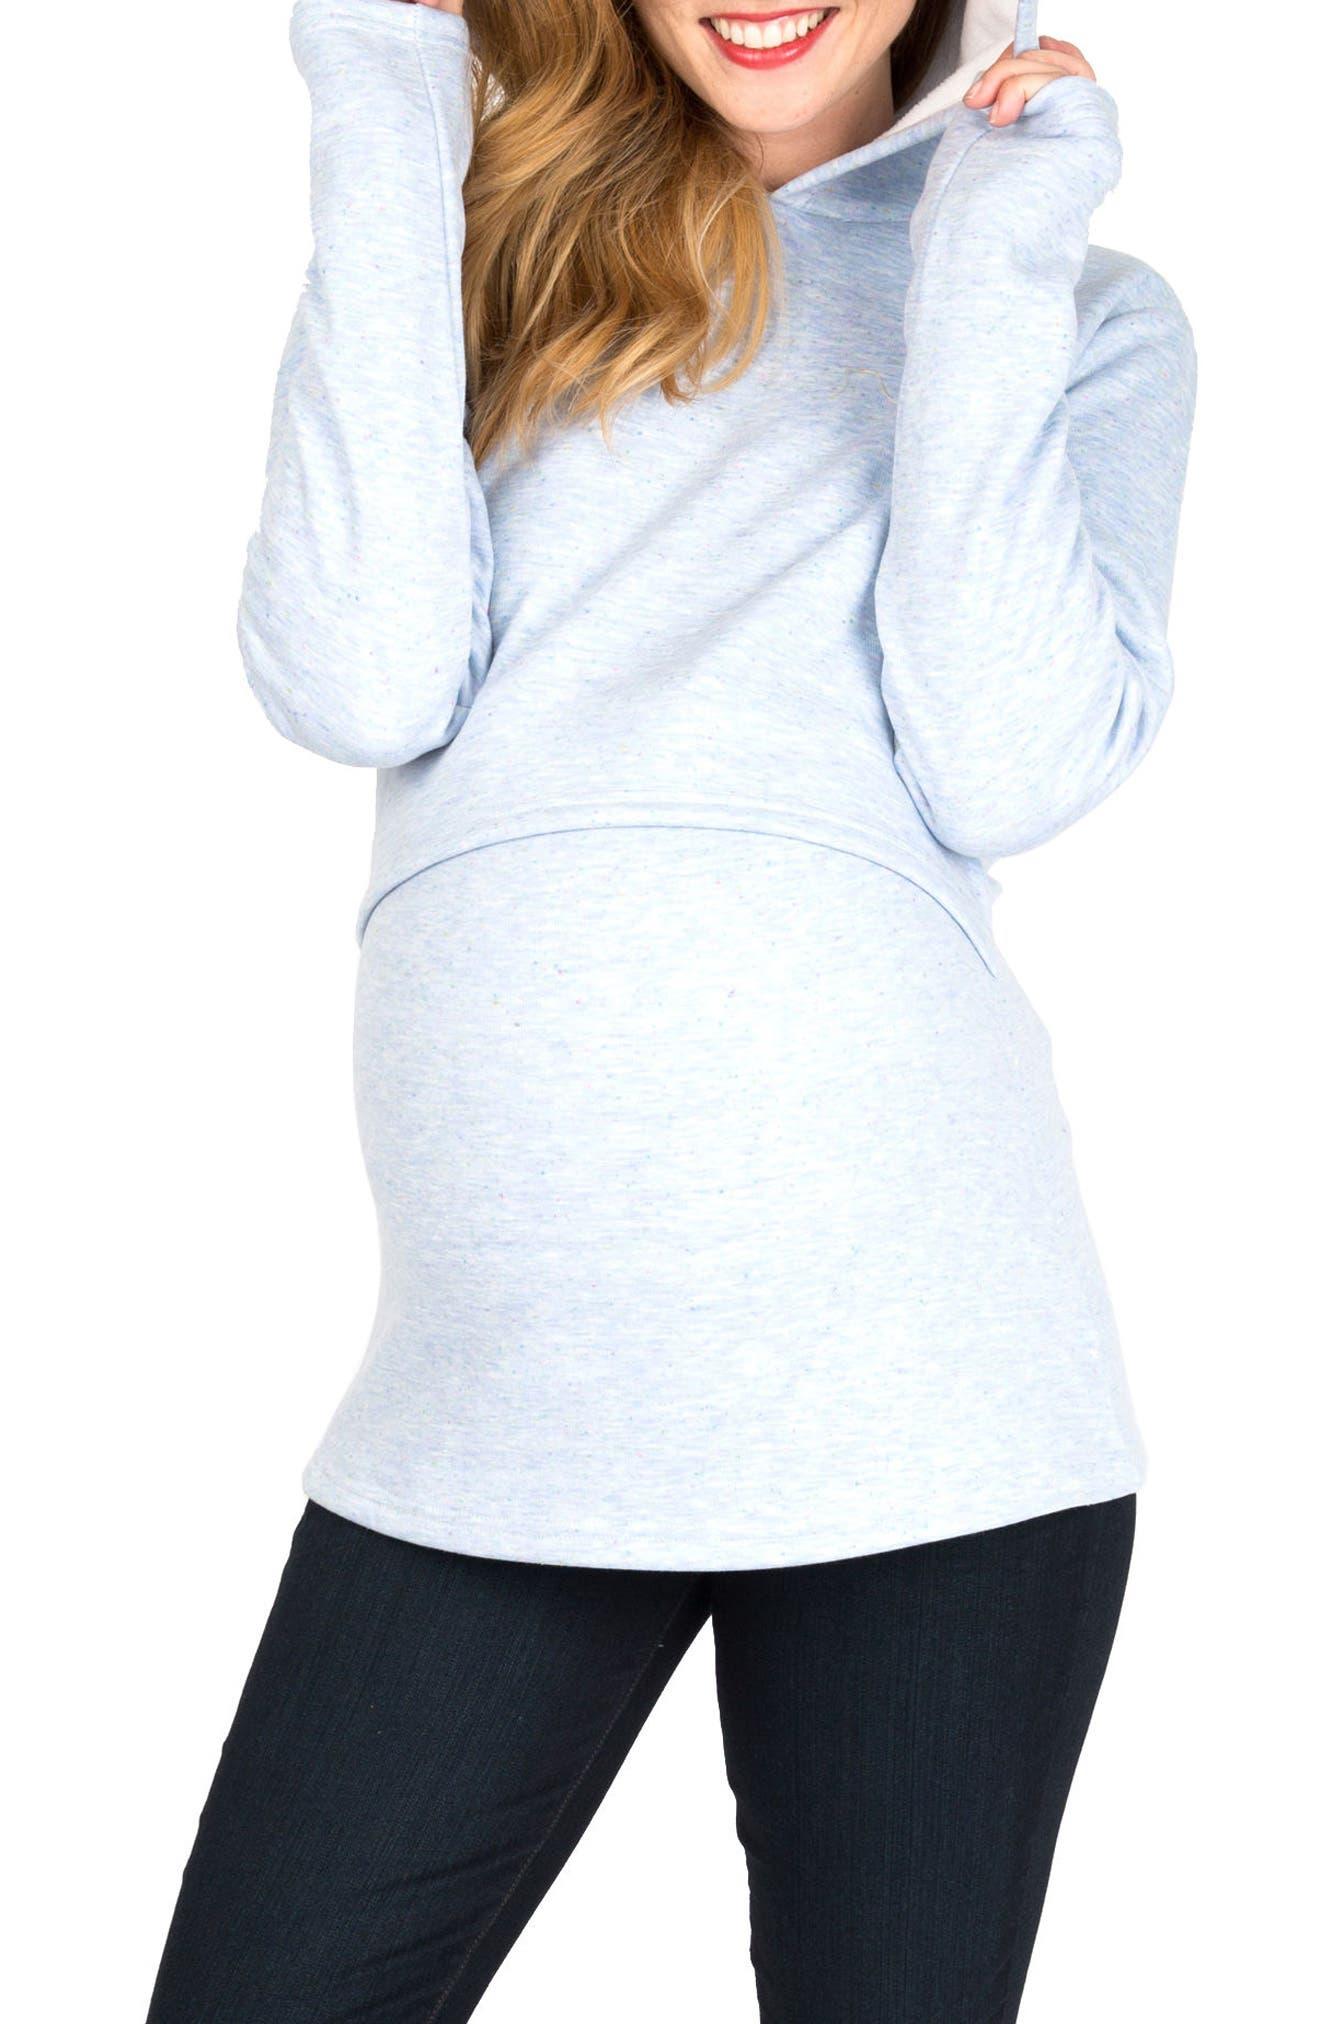 Main Image - Nom Maternity Rory Maternity/Nursing Hoodie